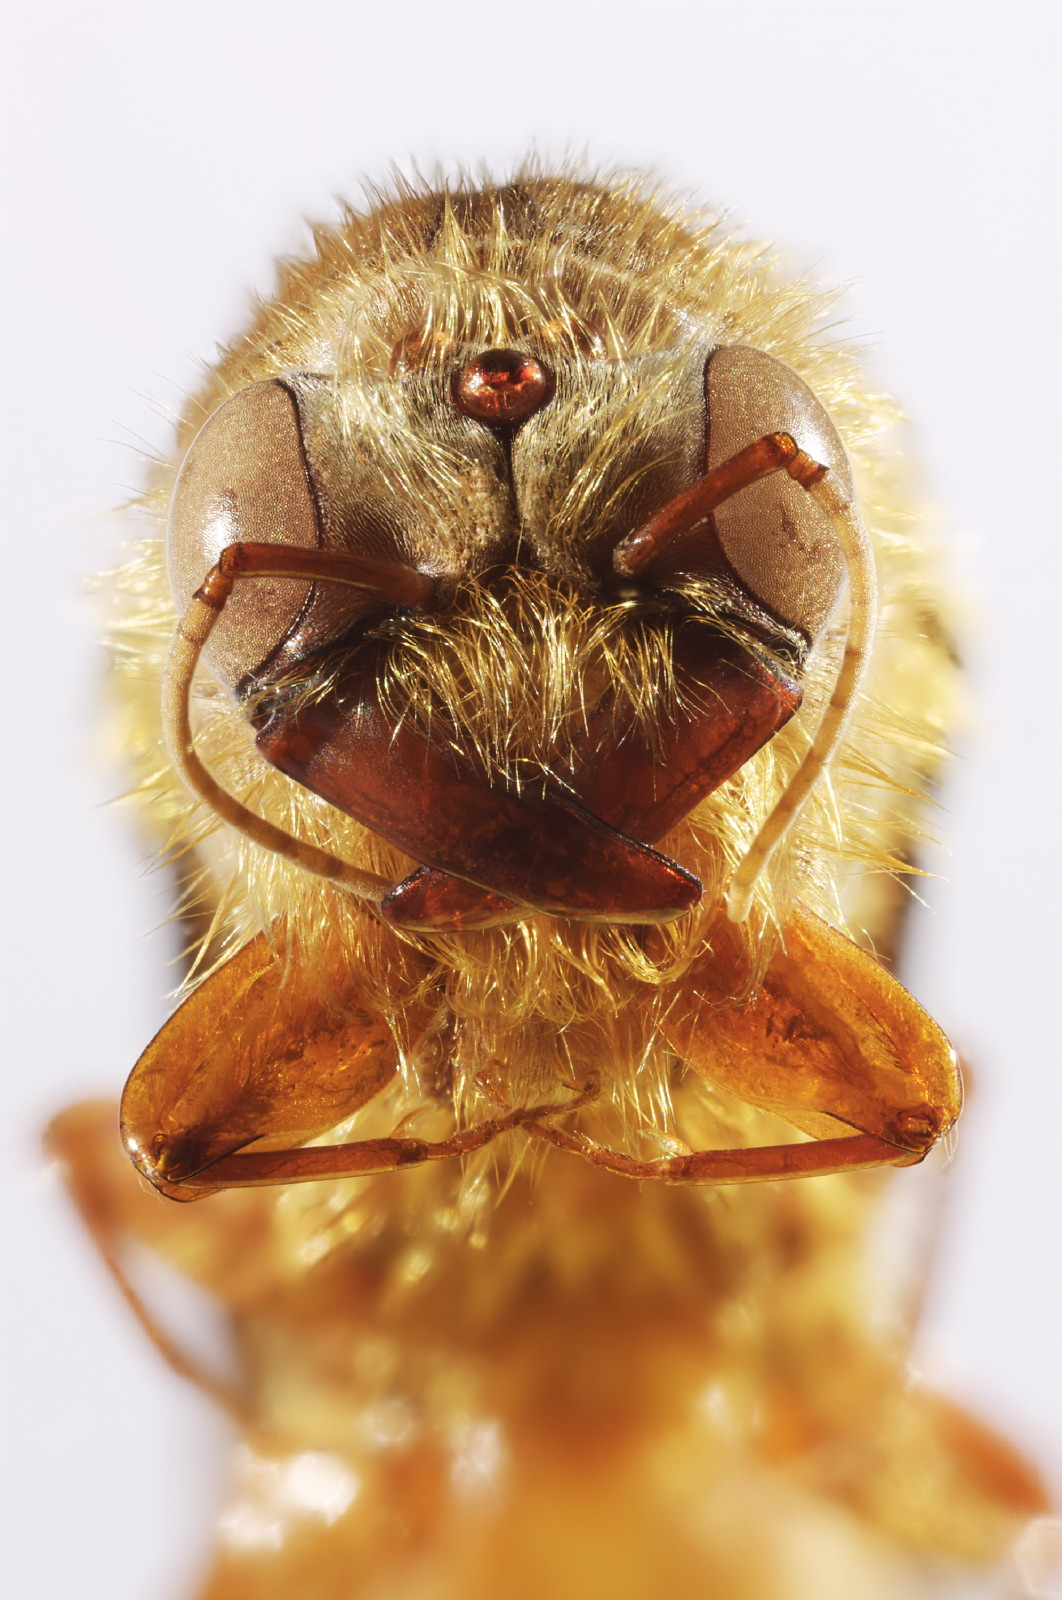 Dorylus ant portrait frontal